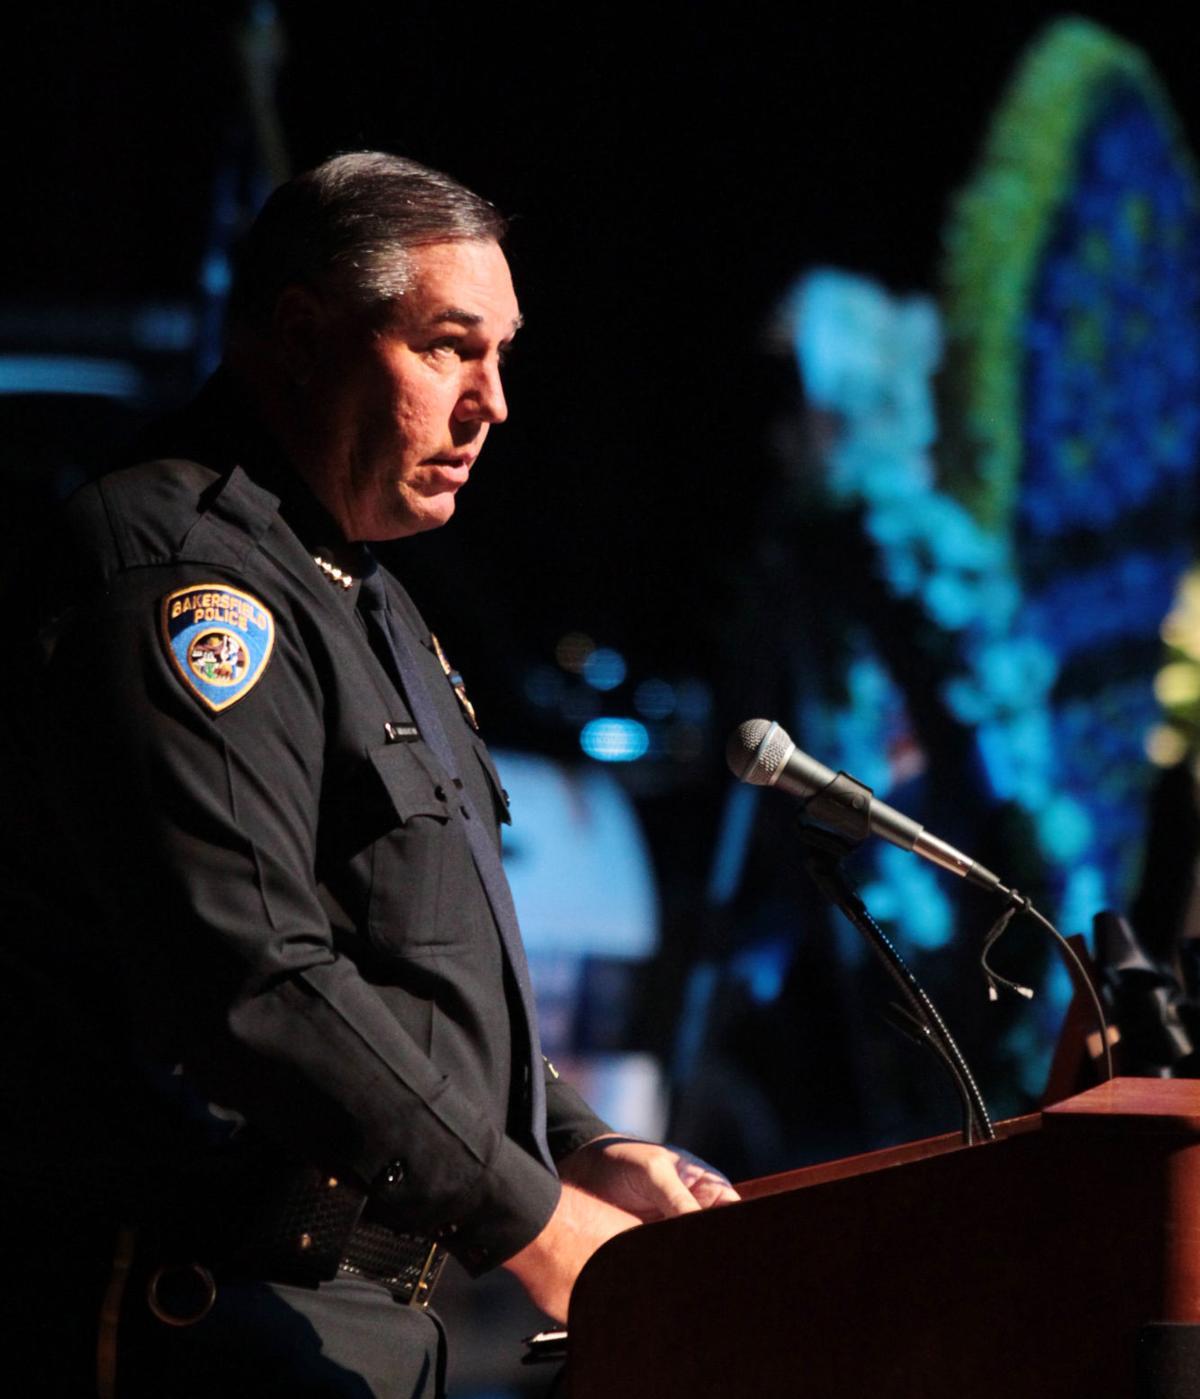 Tears, Laughter Mark Bakersfield Police Officer's Memorial